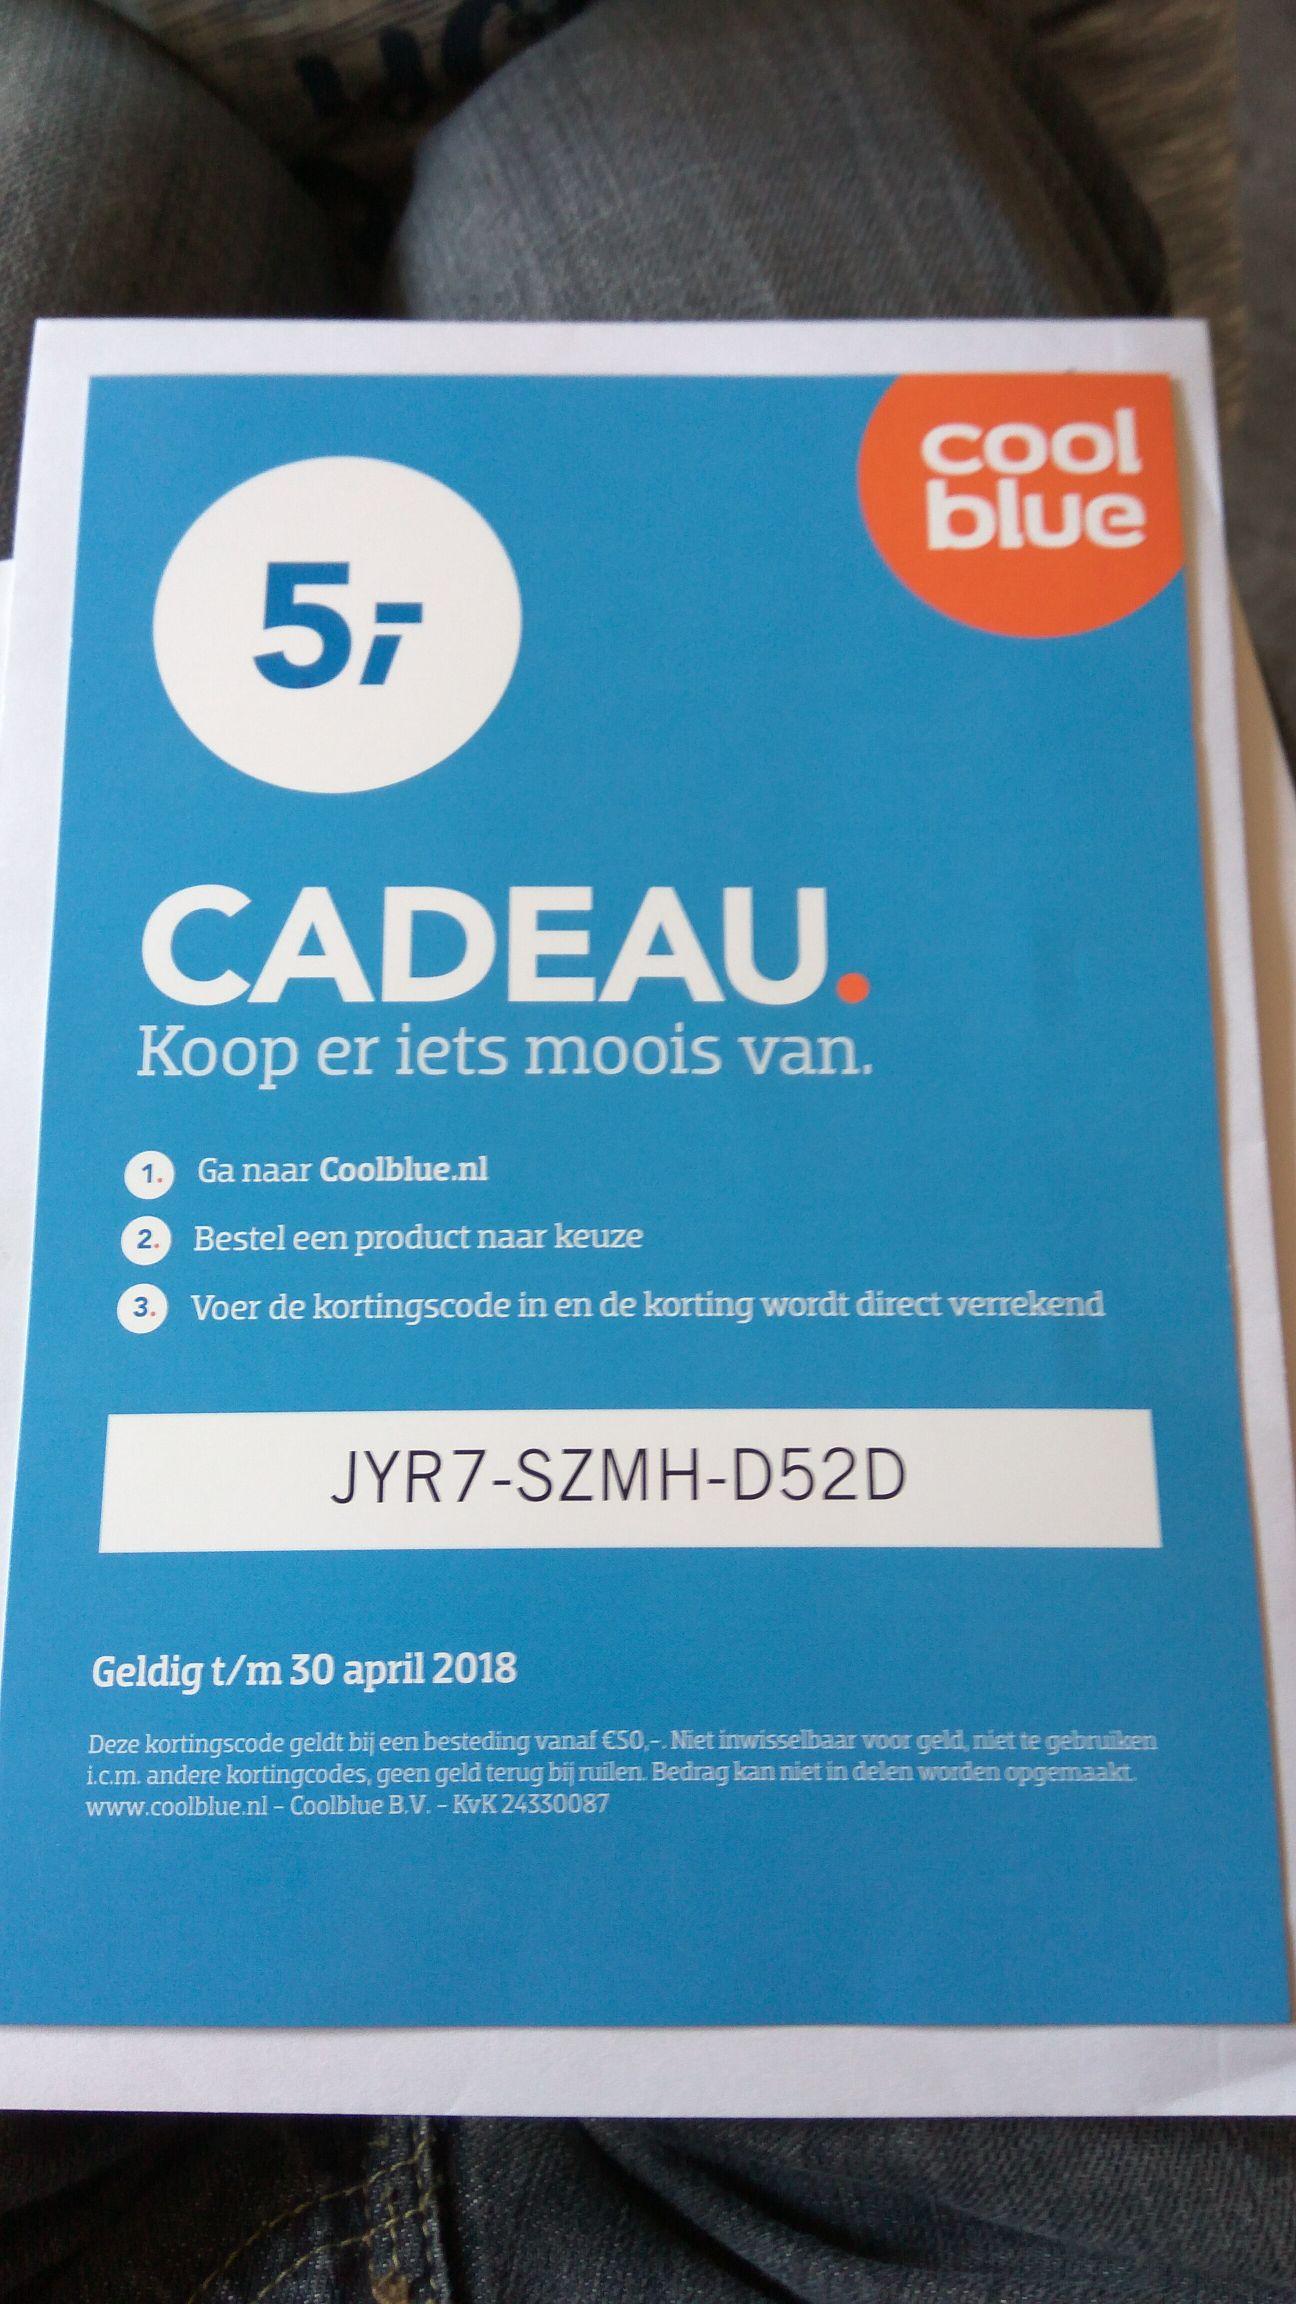 Coolblue €5,- korting vanaf €50,-